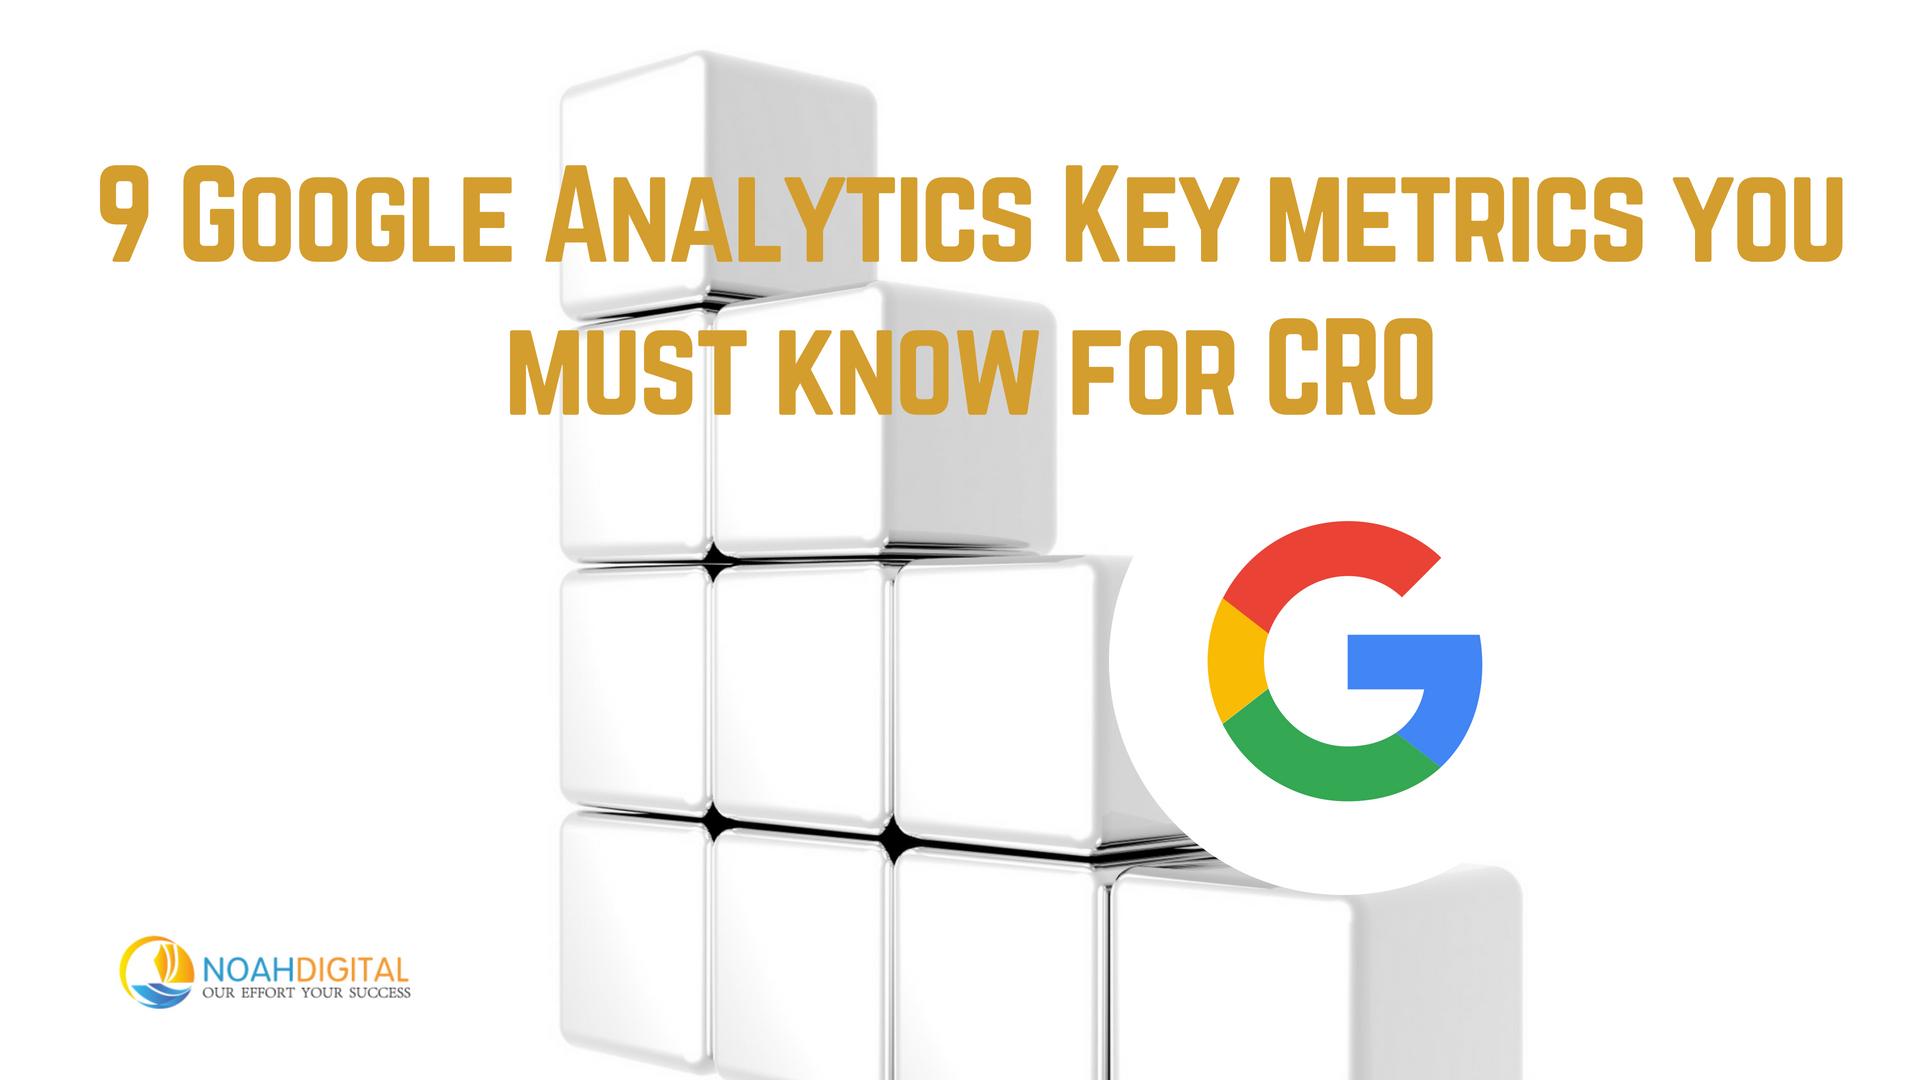 9 Google Analytics Key Metrics You Must Know For Cro Noah Digital